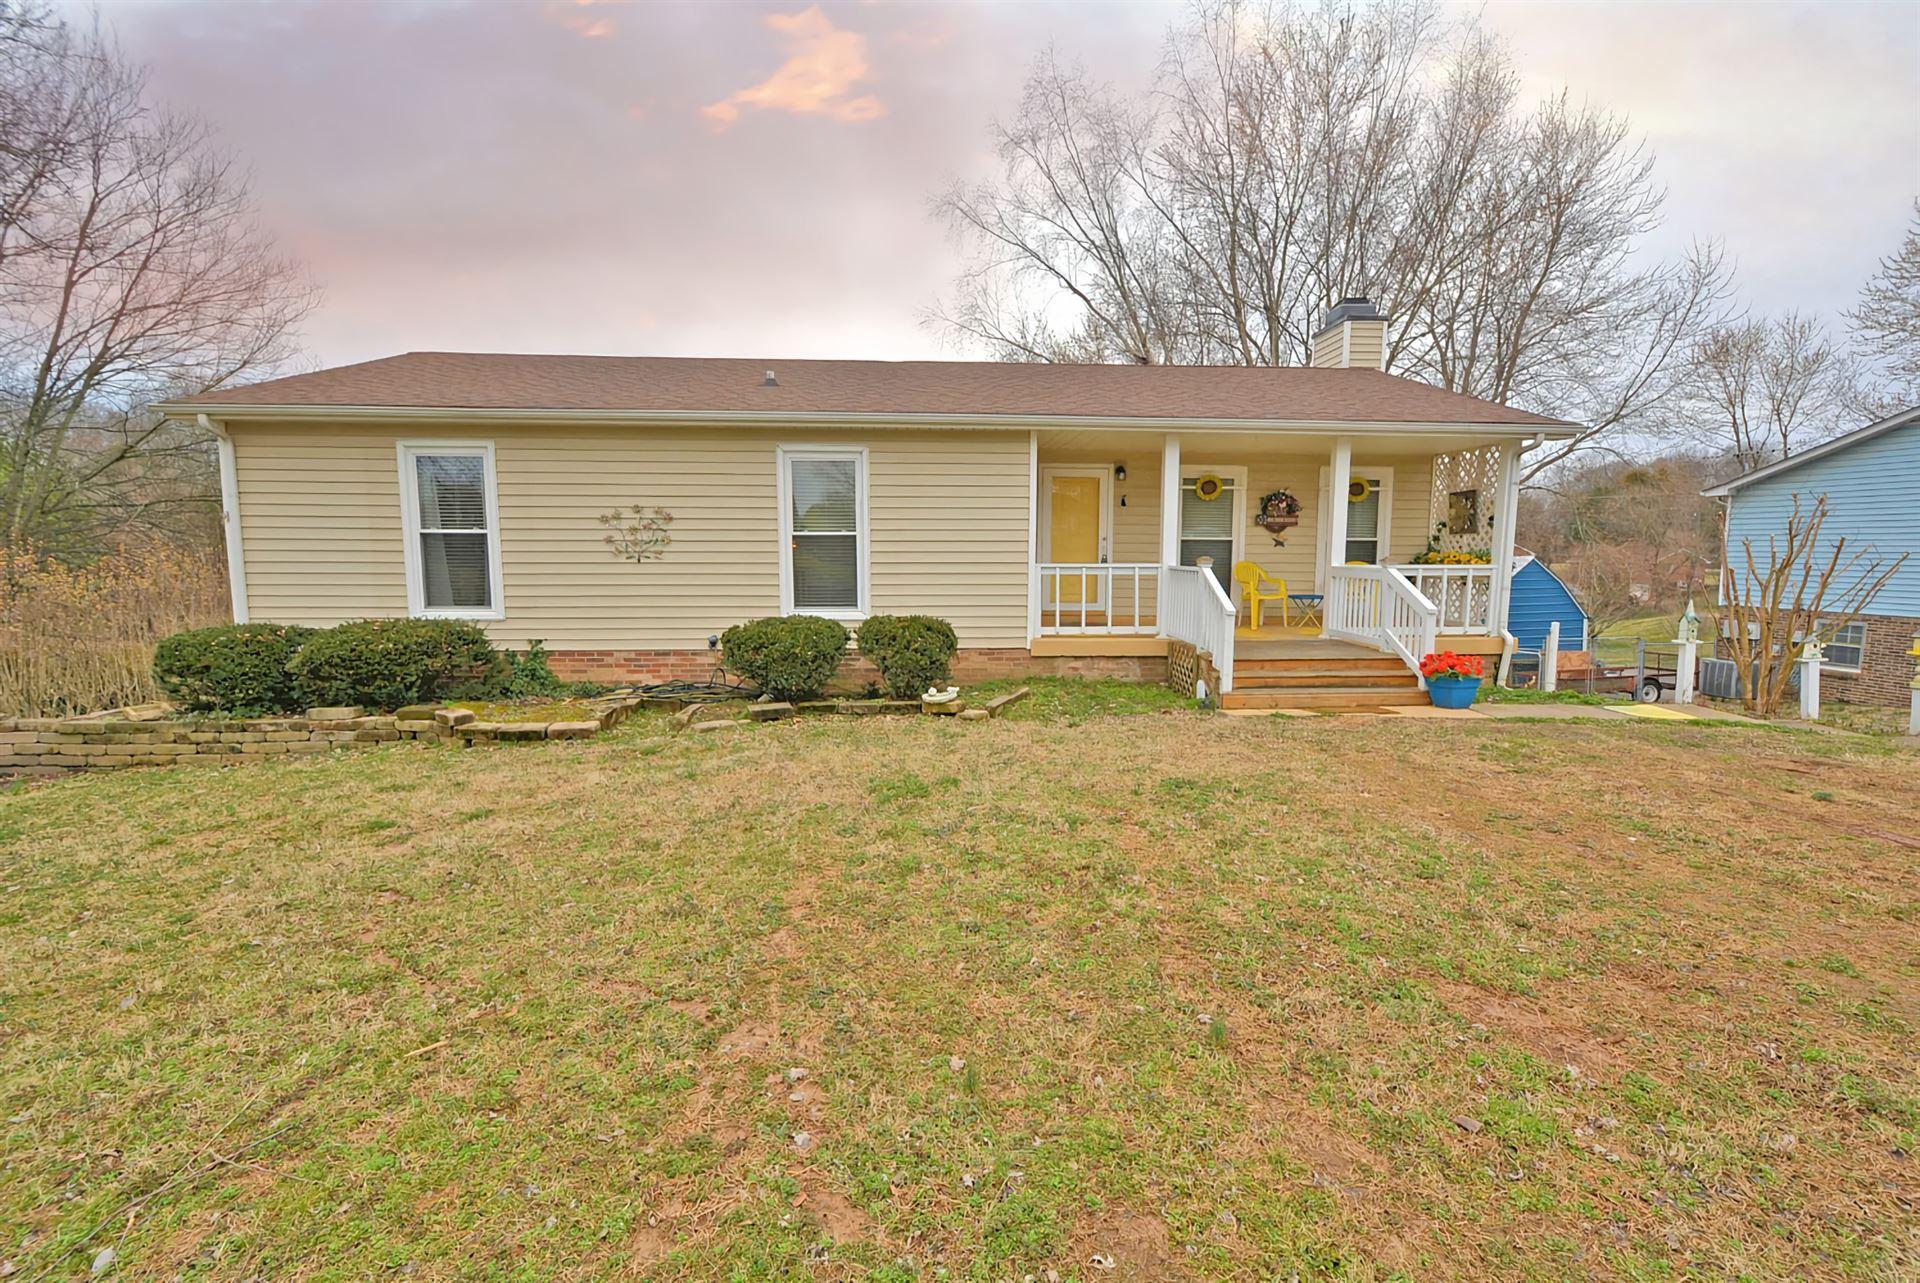 706 Rossview Rd, Clarksville, TN 37043 - MLS#: 2232407